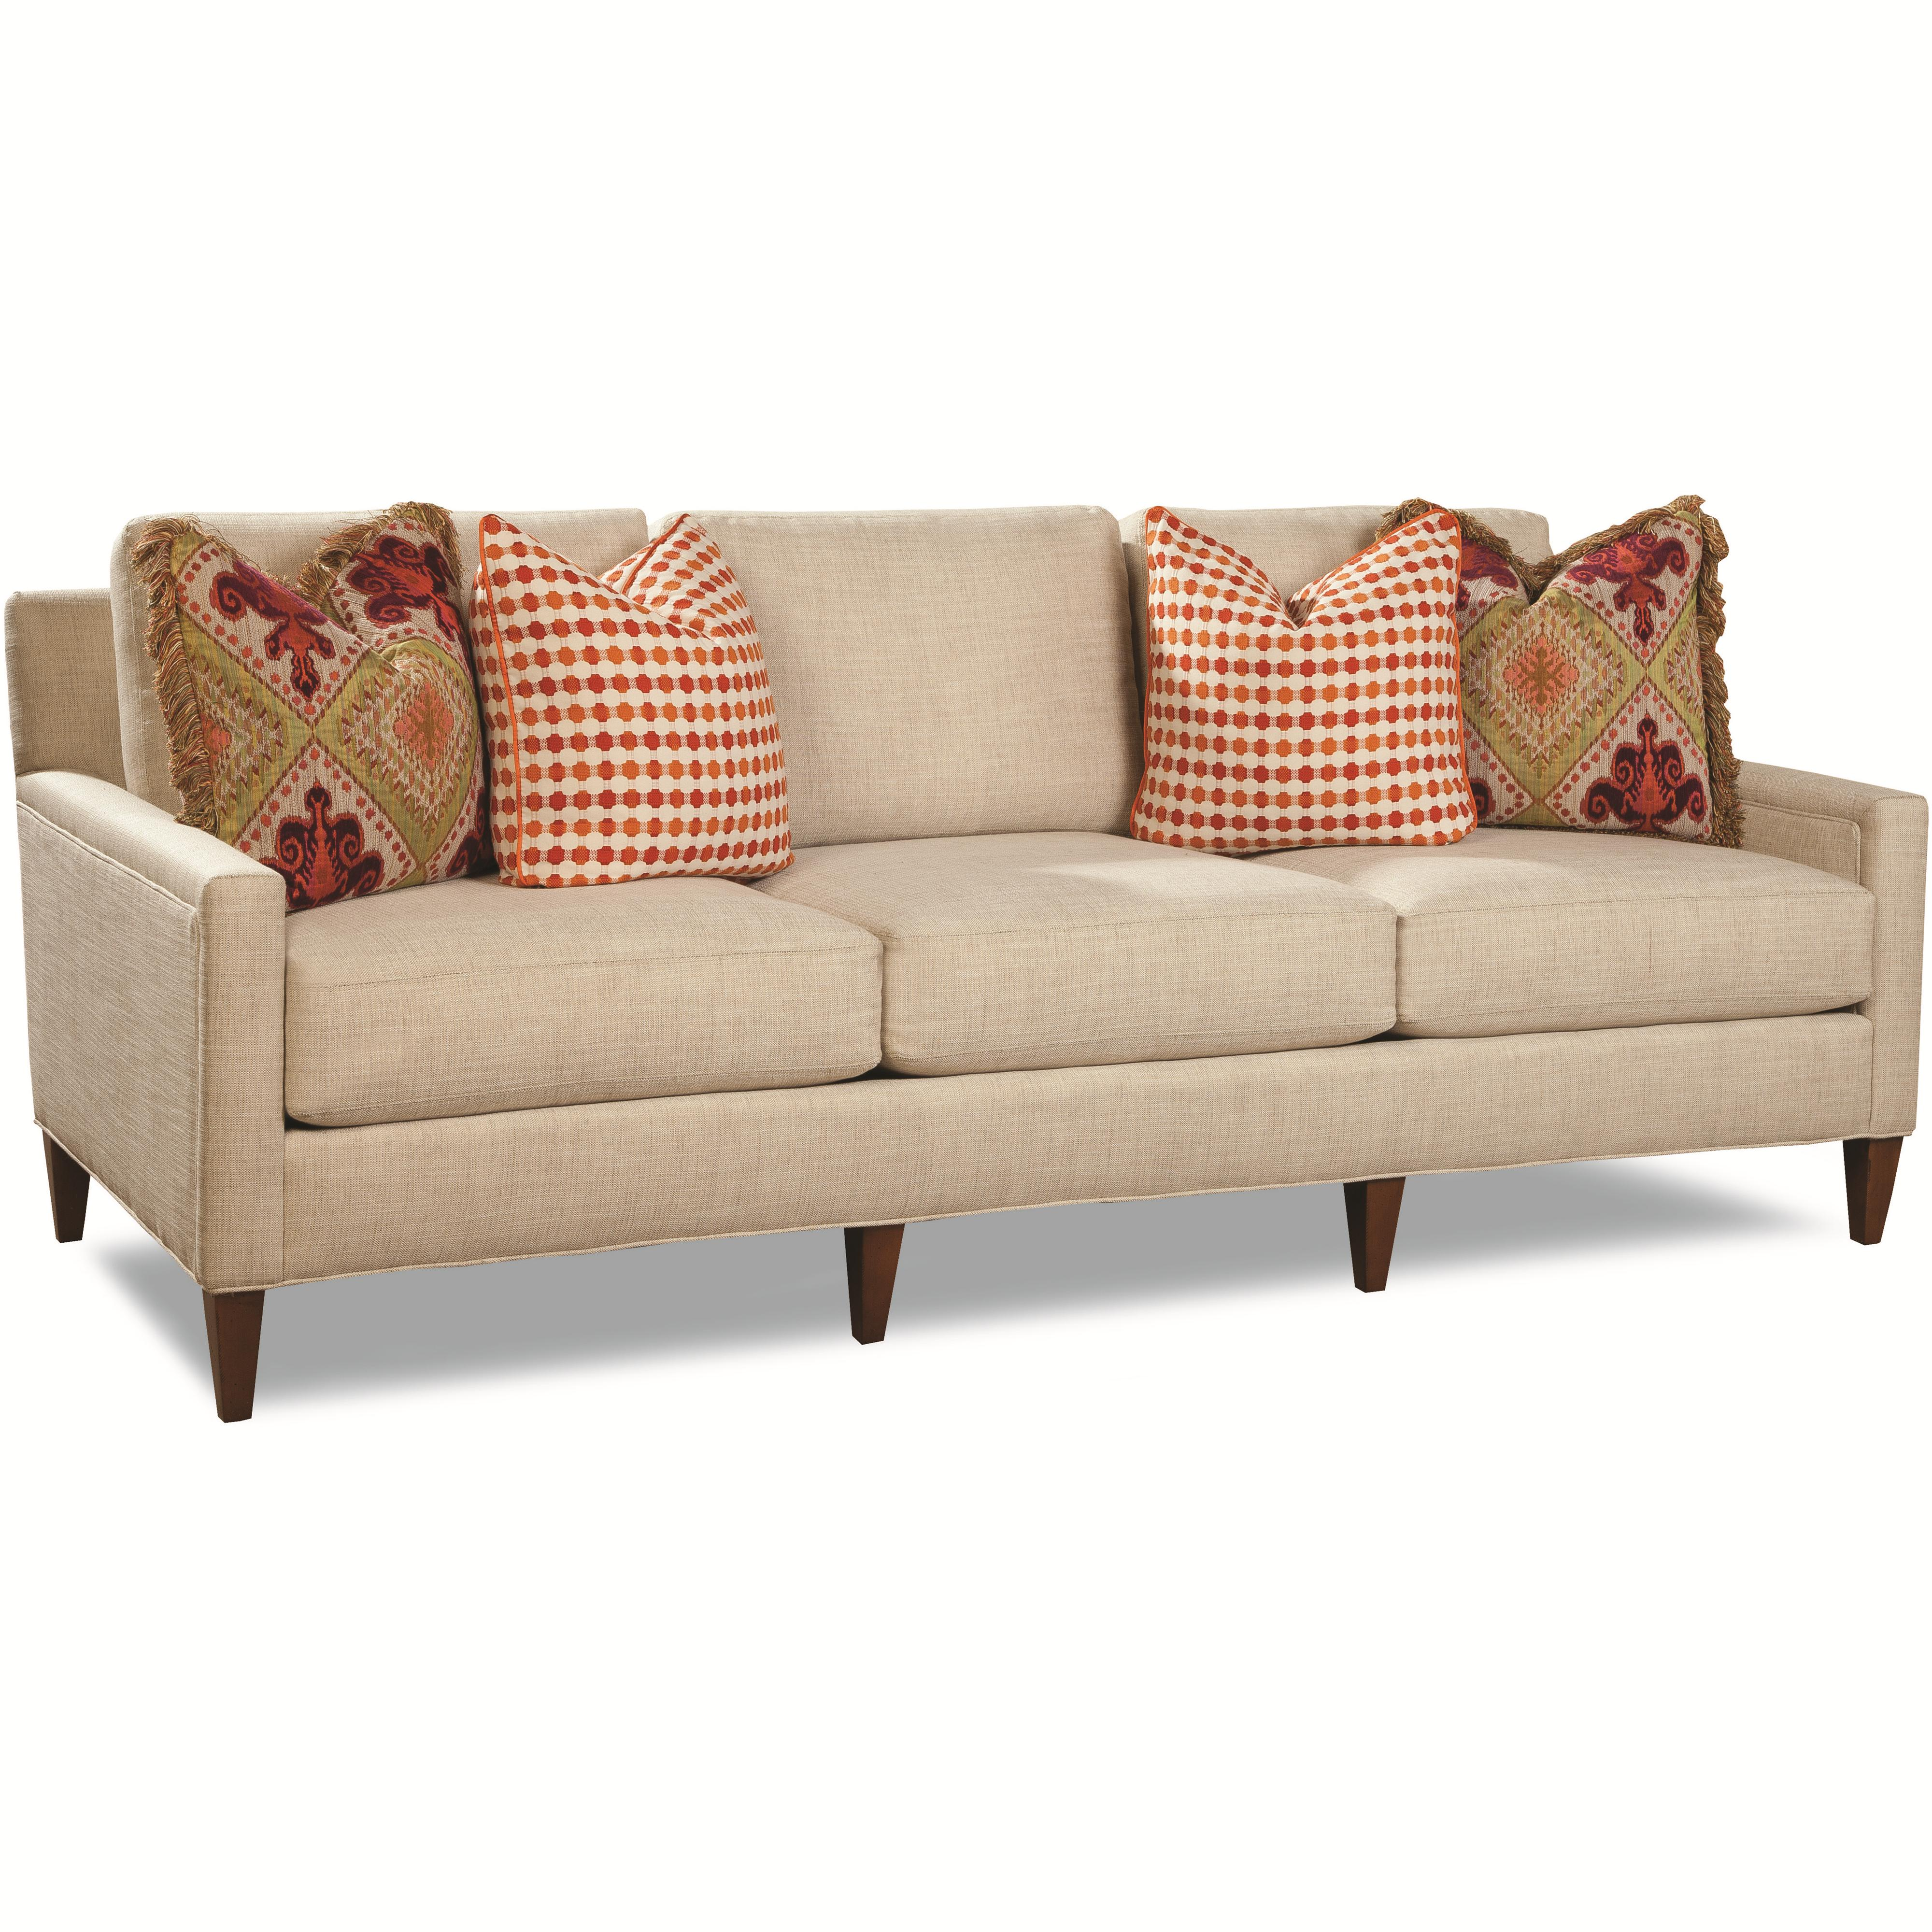 7209 Contemporary Sofa by Geoffrey Alexander at Sprintz Furniture